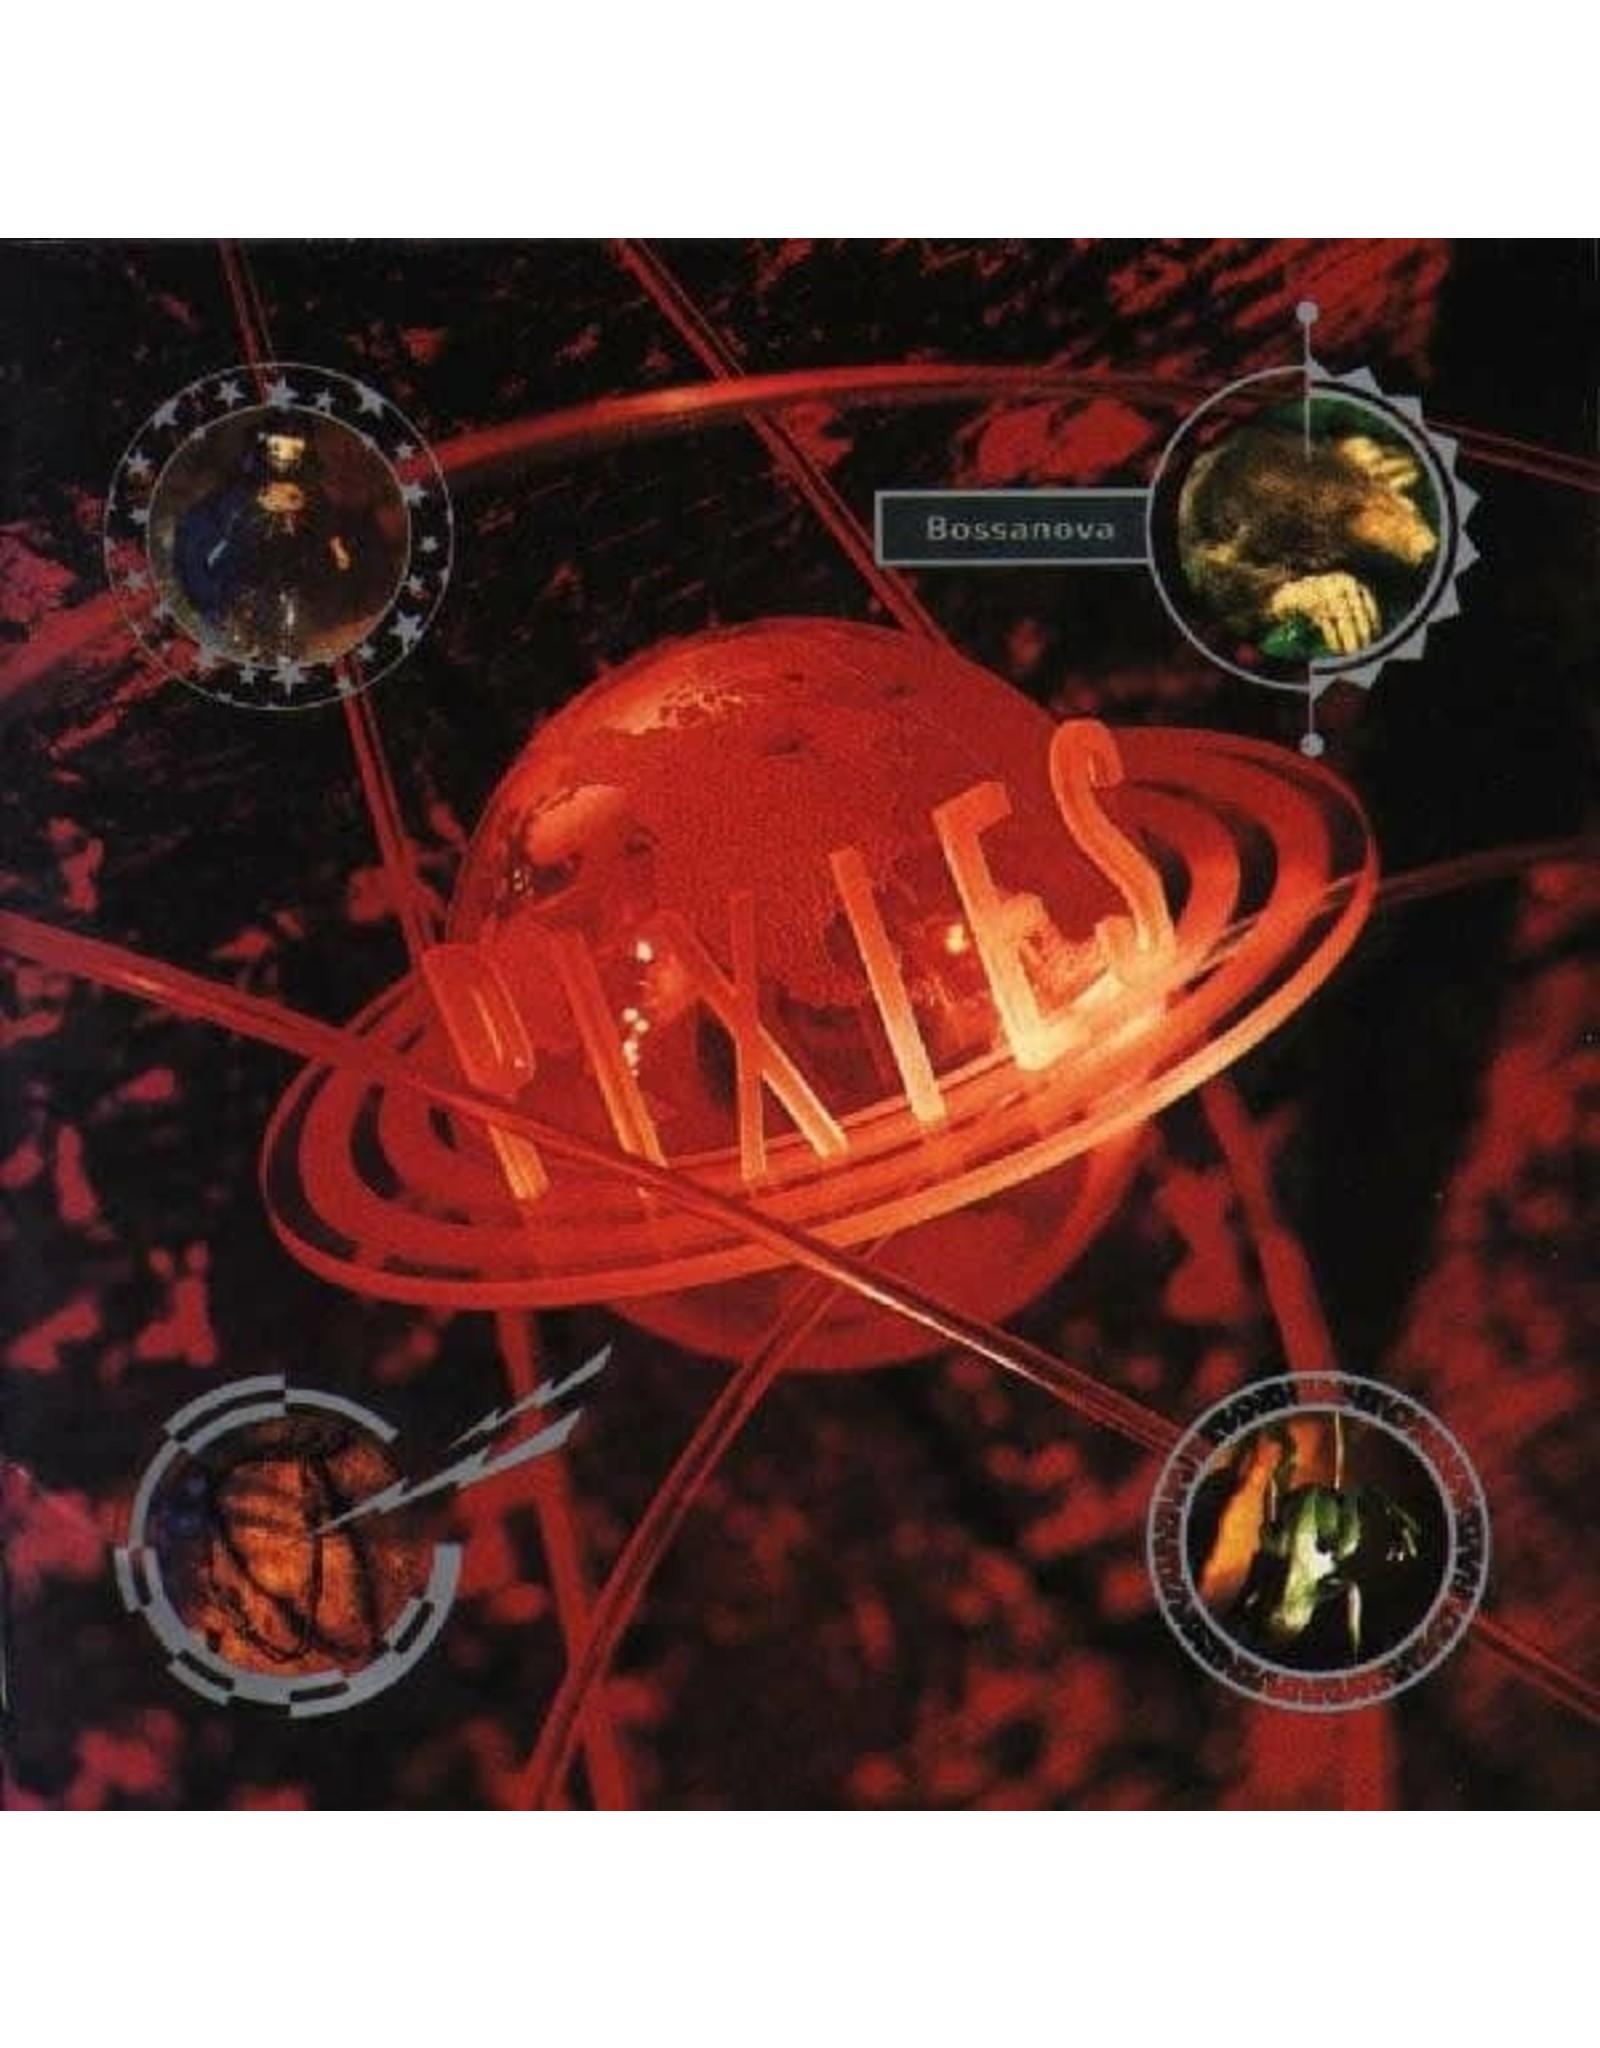 Pixies - Bossanova (30th Anniversary) LP